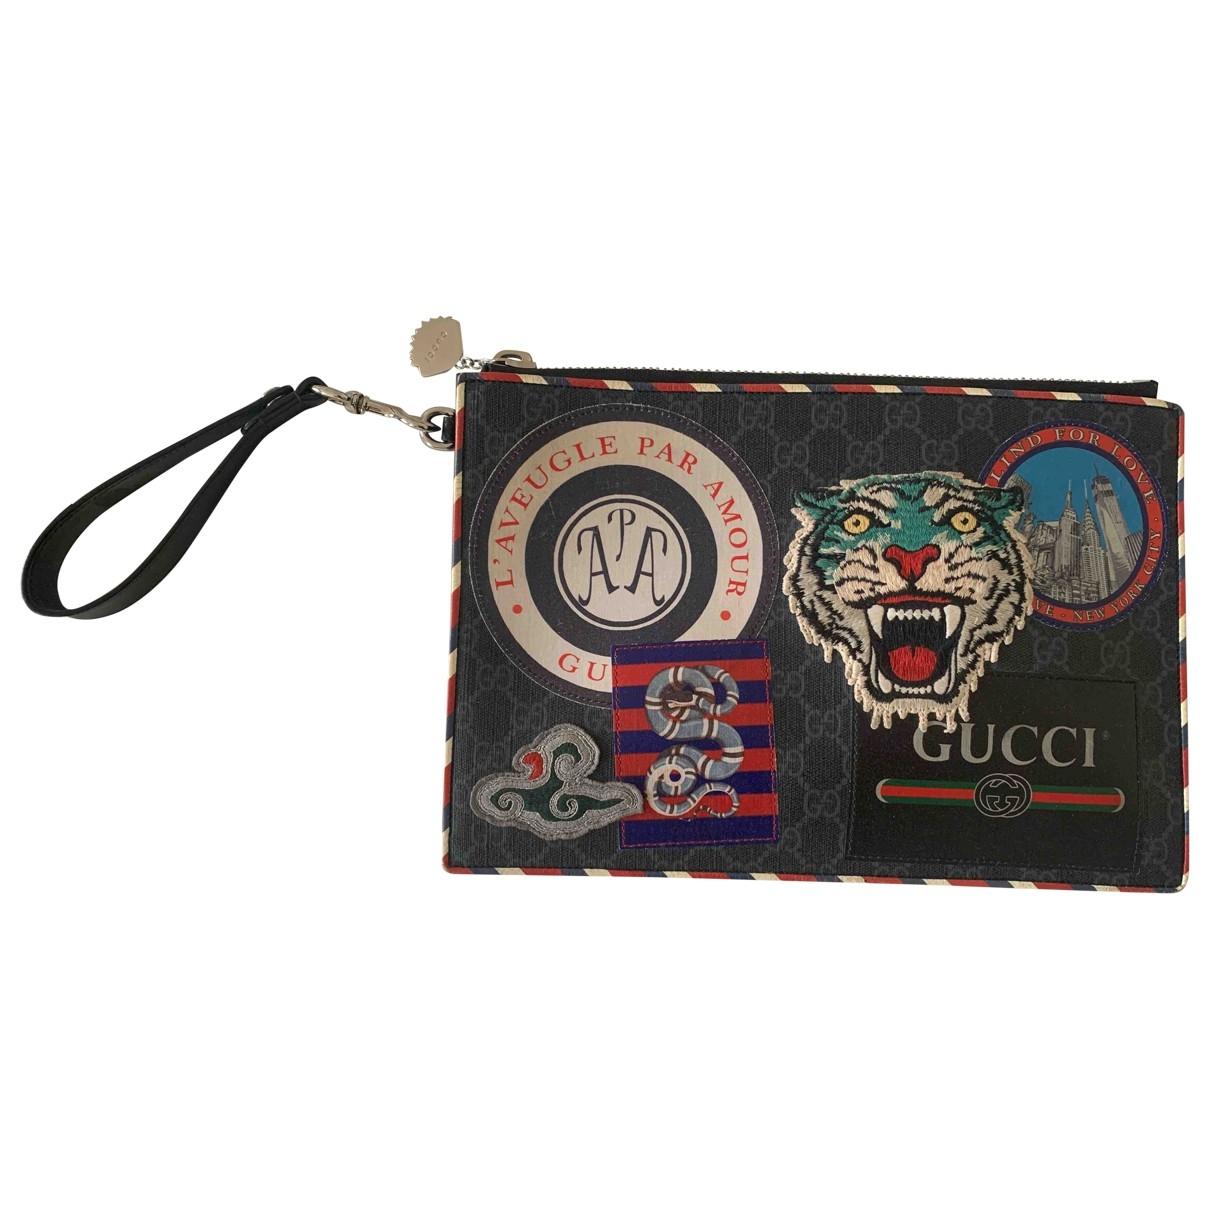 Gucci - Petite maroquinerie   pour homme en toile - anthracite